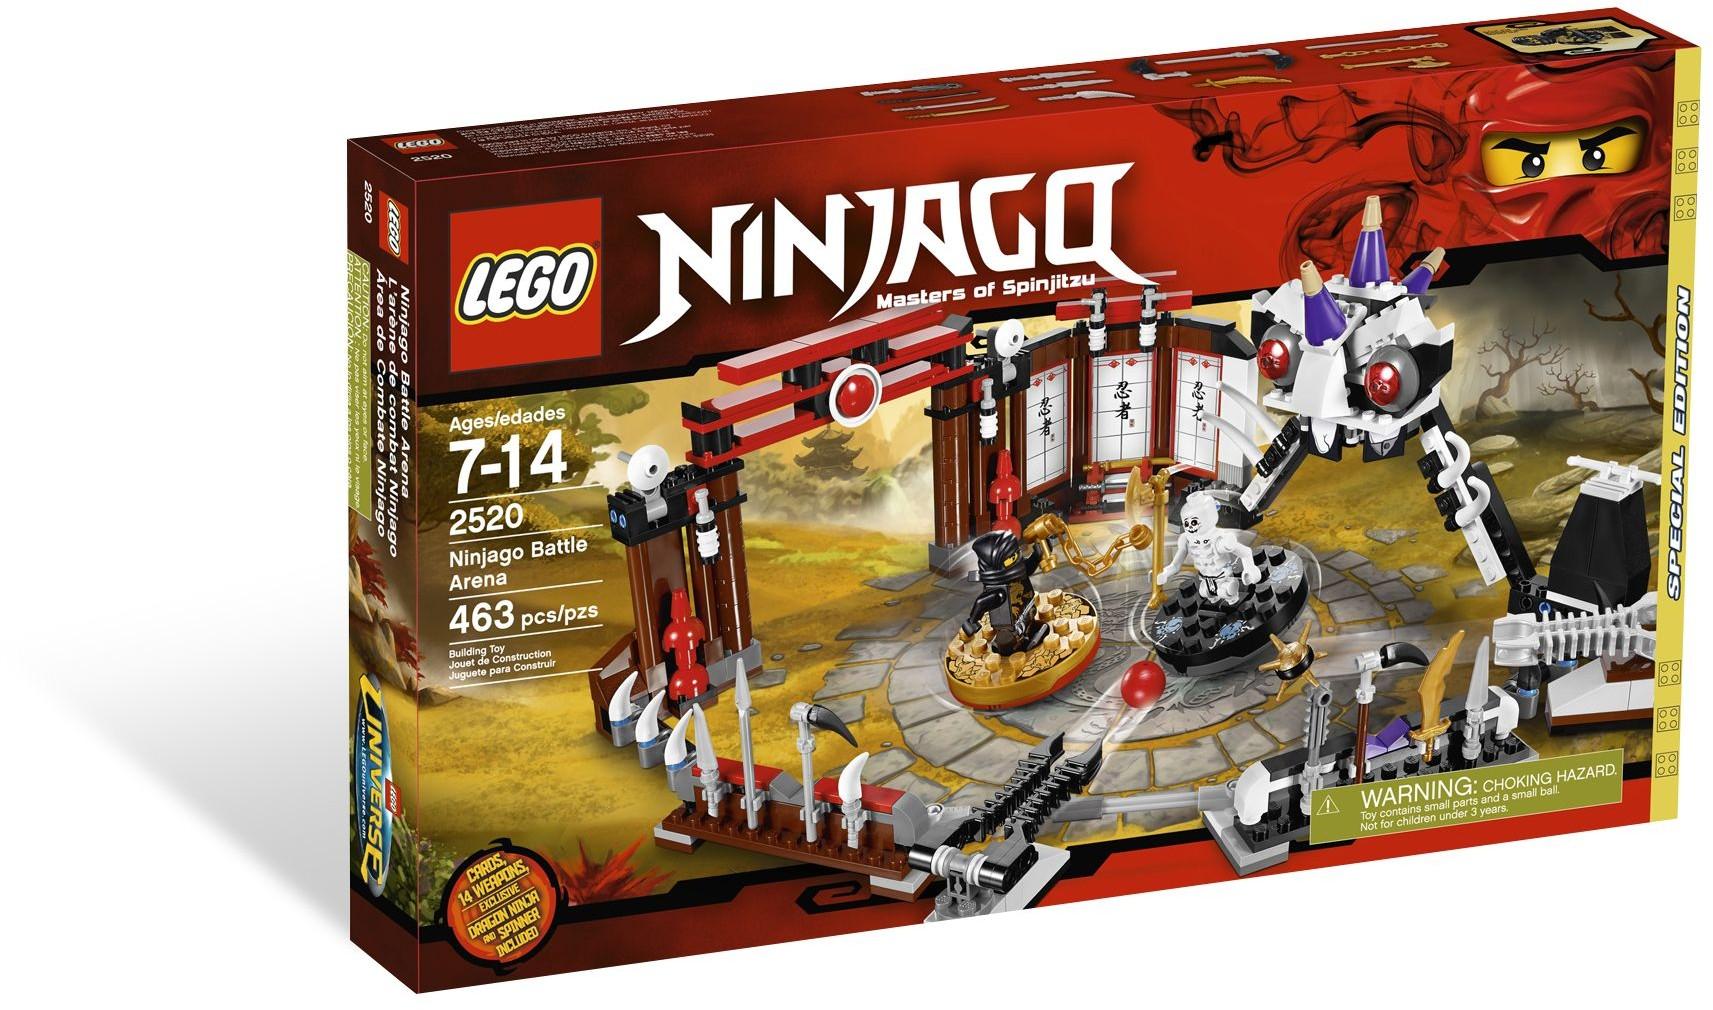 File:Ninjagobattlearena.jpg